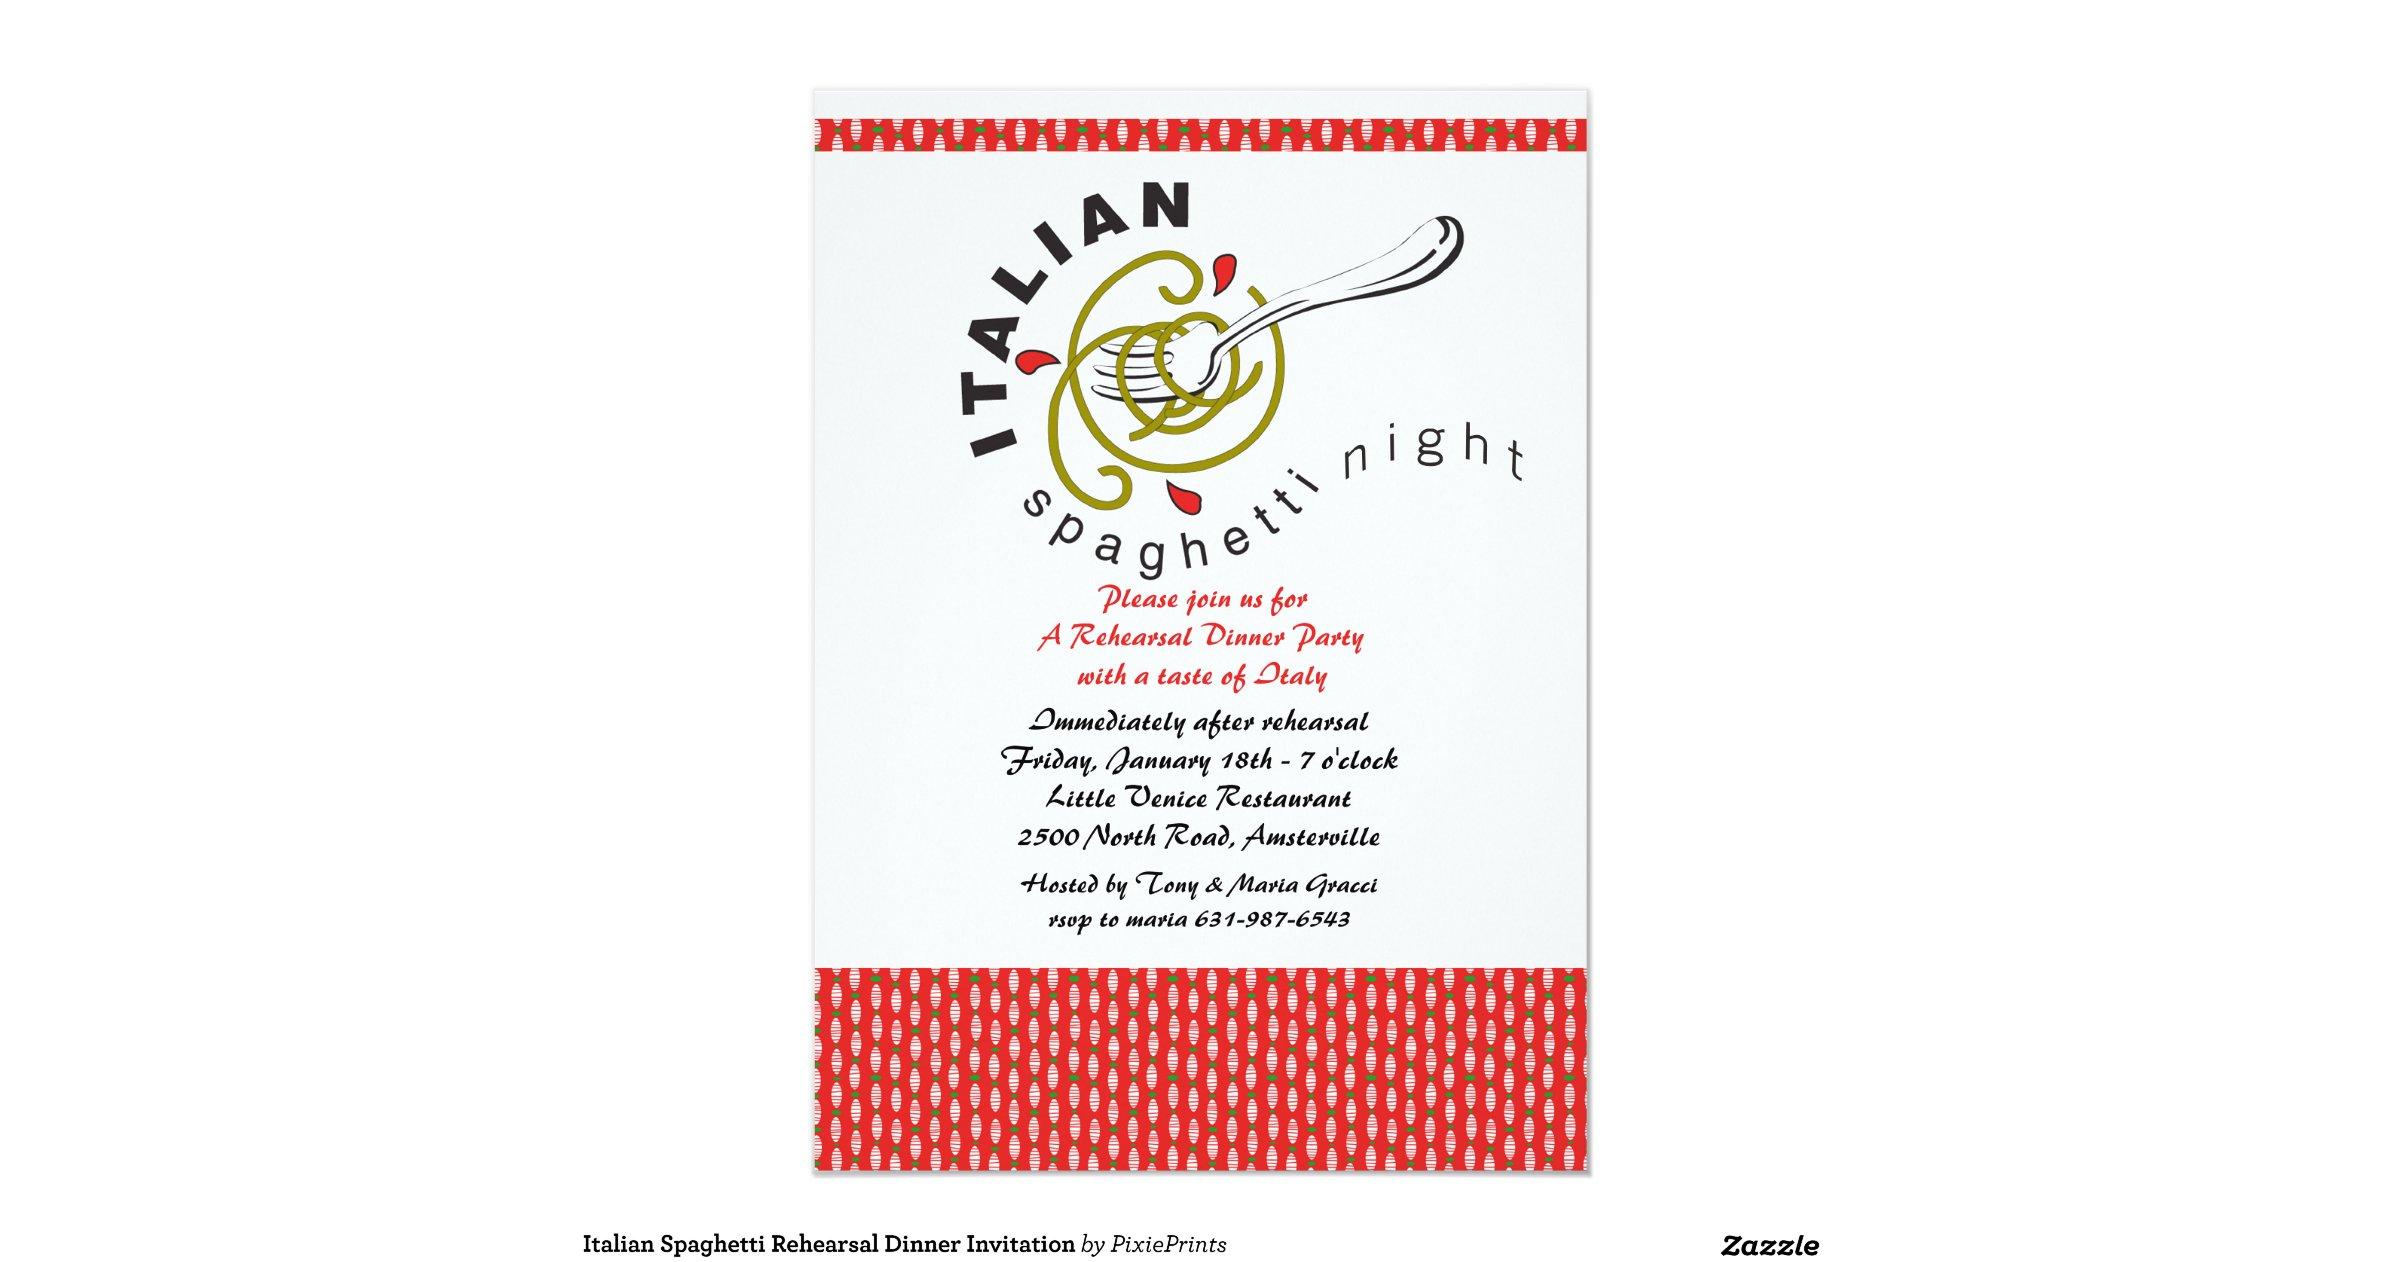 italian spaghetti rehearsal dinner invitation rfa5ae8aaf21b4912bb633f7907e42394 zkrqs